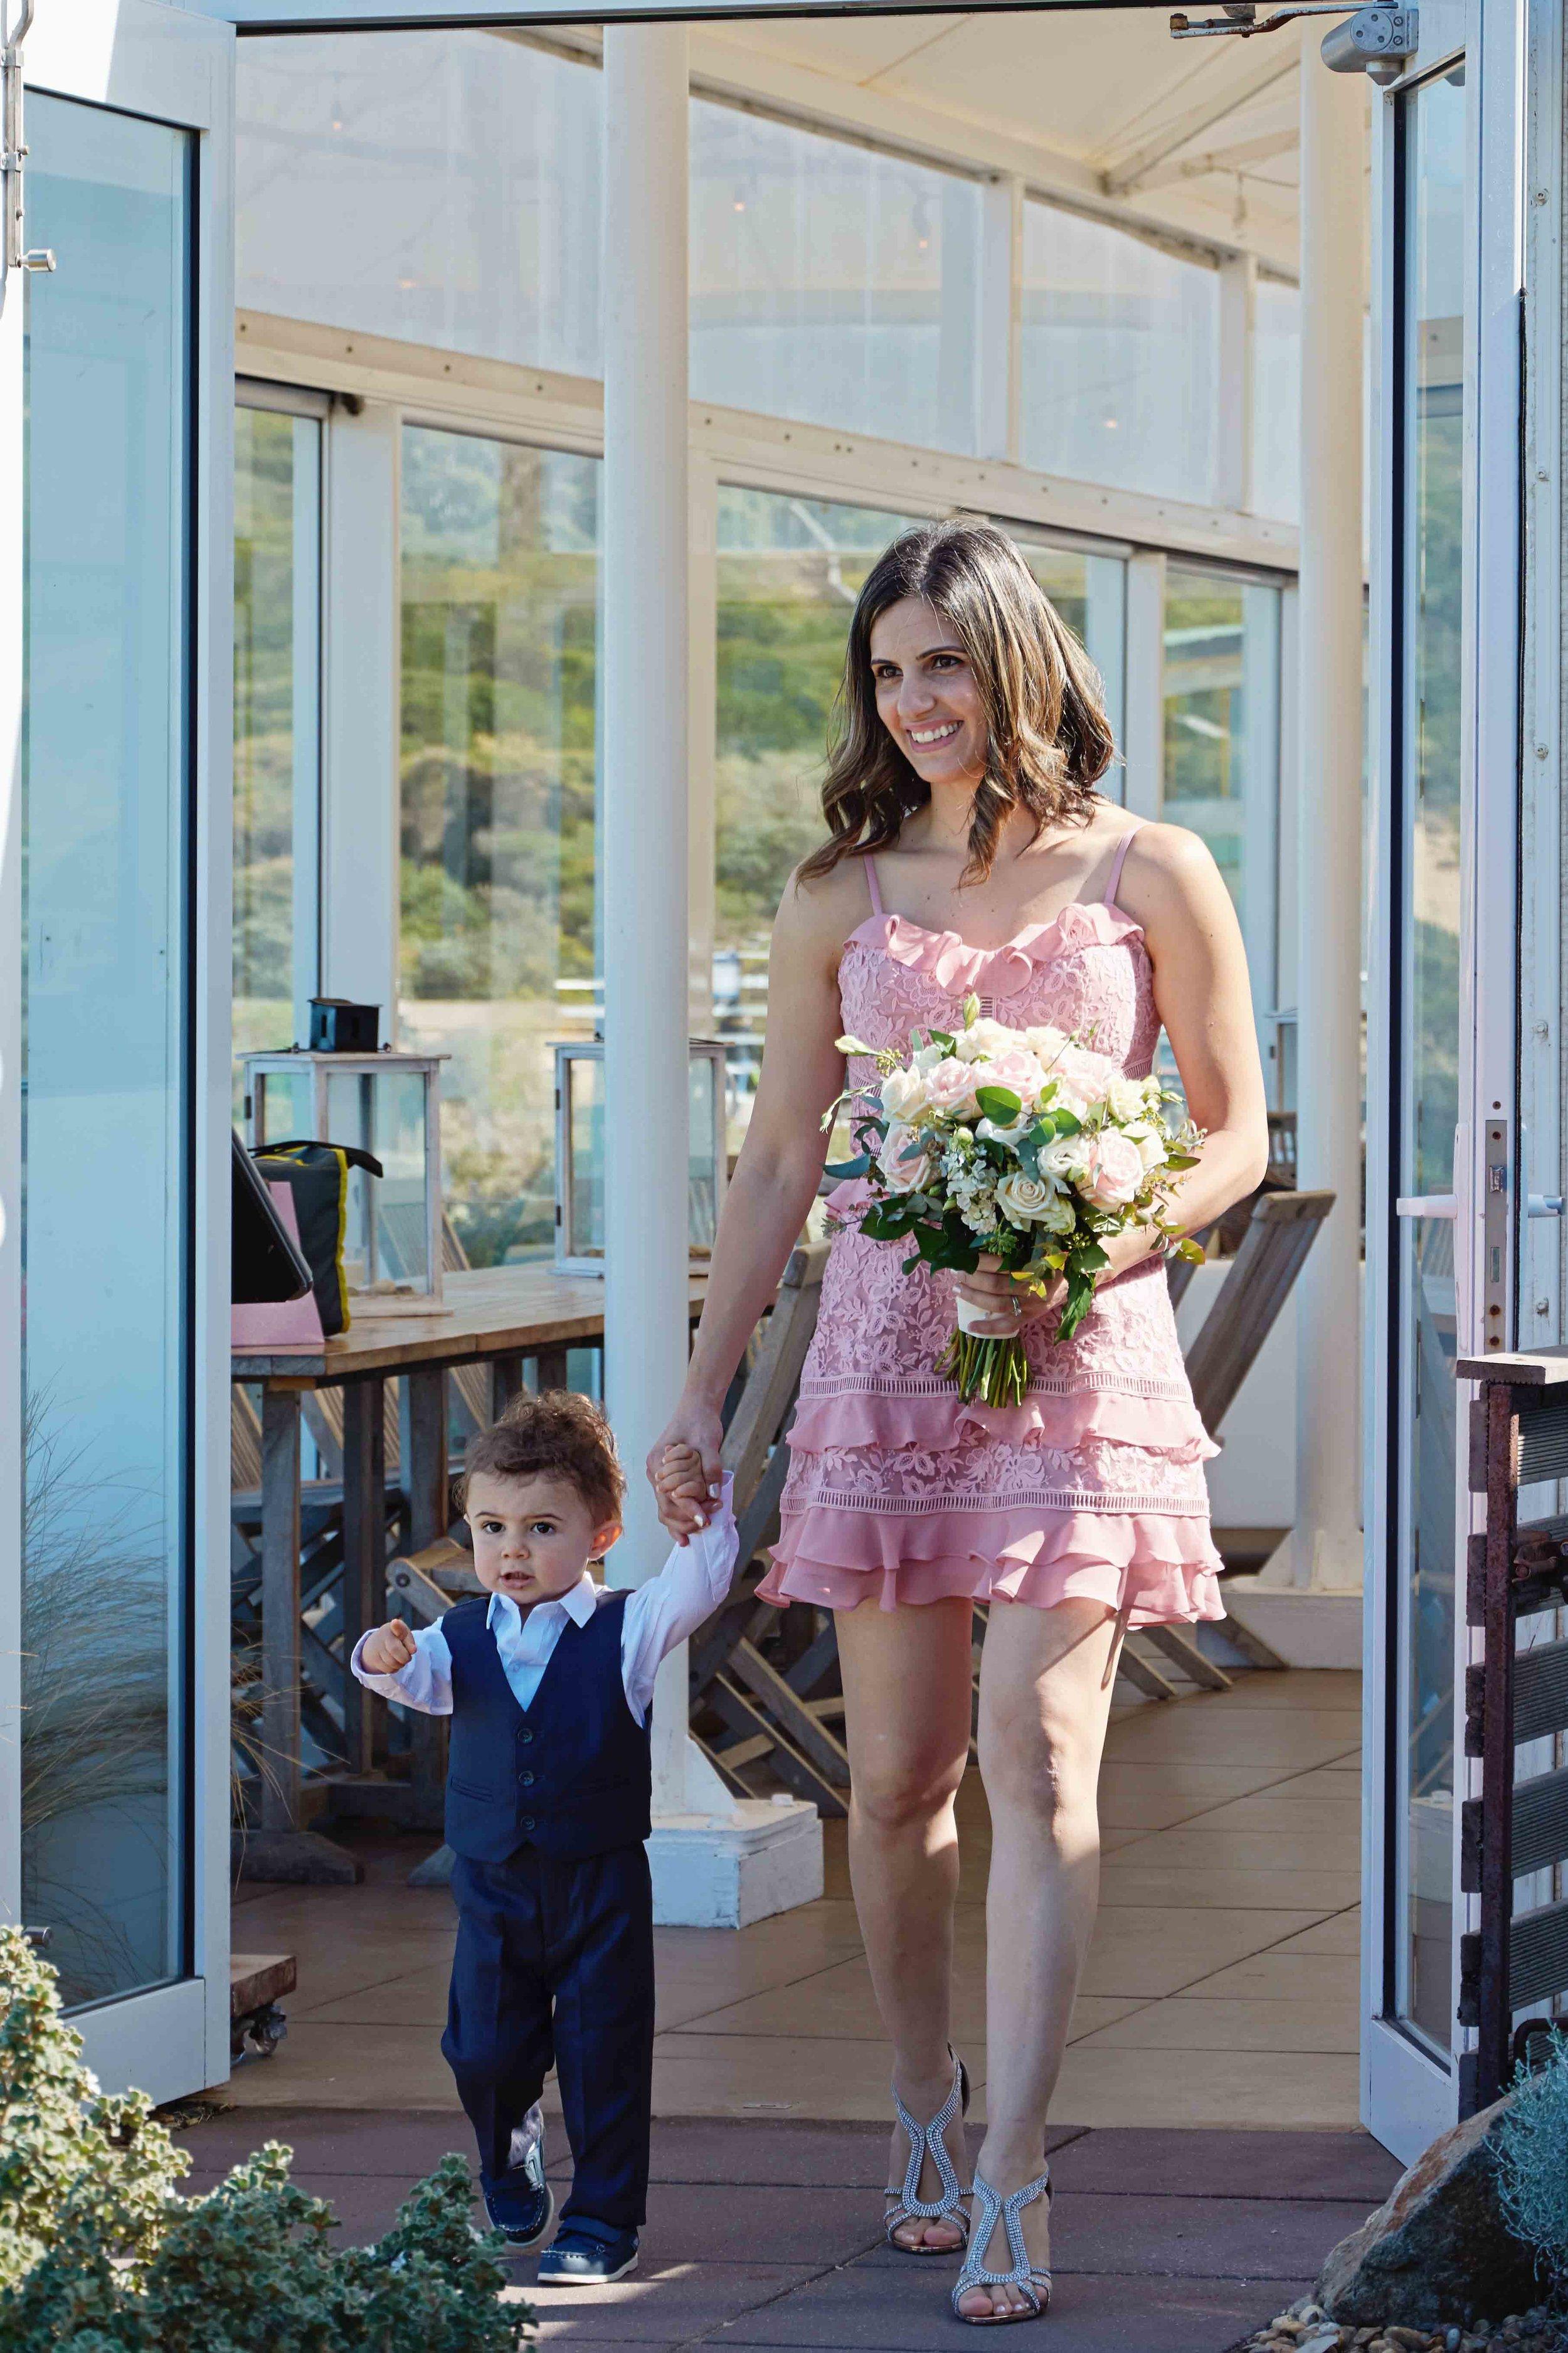 sorrento-wedding-photography-all-smiles-marissa-jade-photography-36.jpg